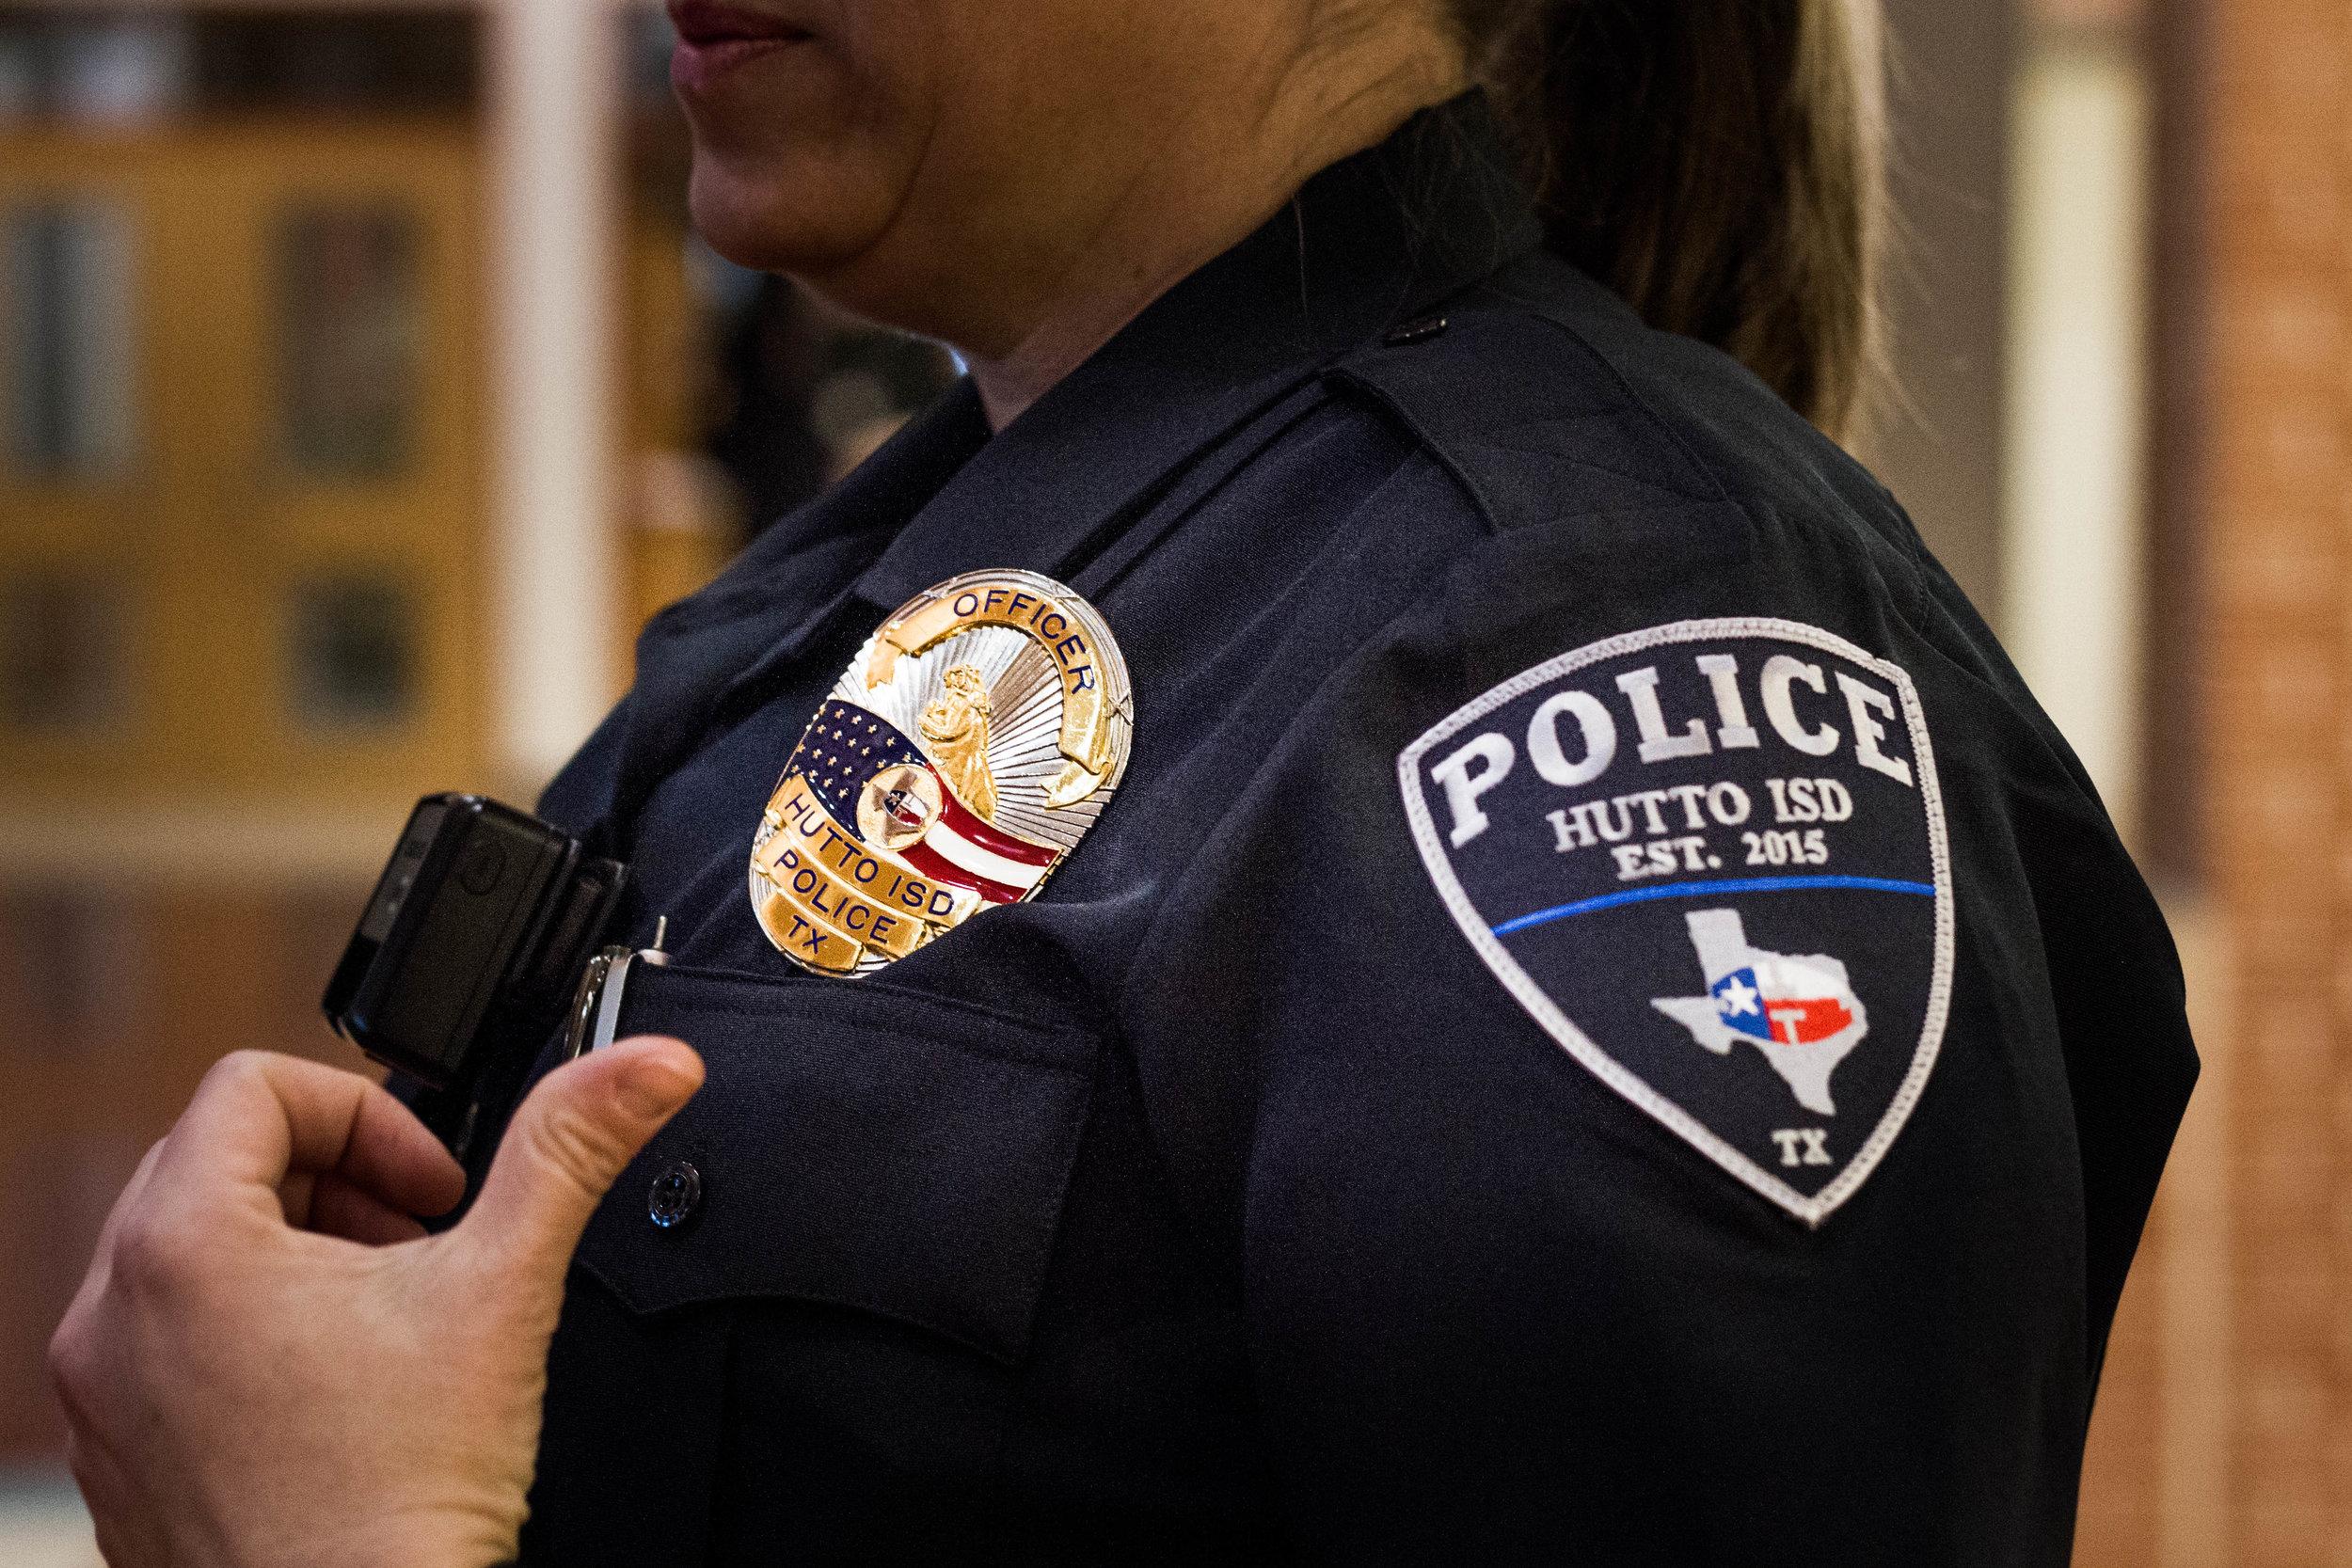 School District Police.jpg